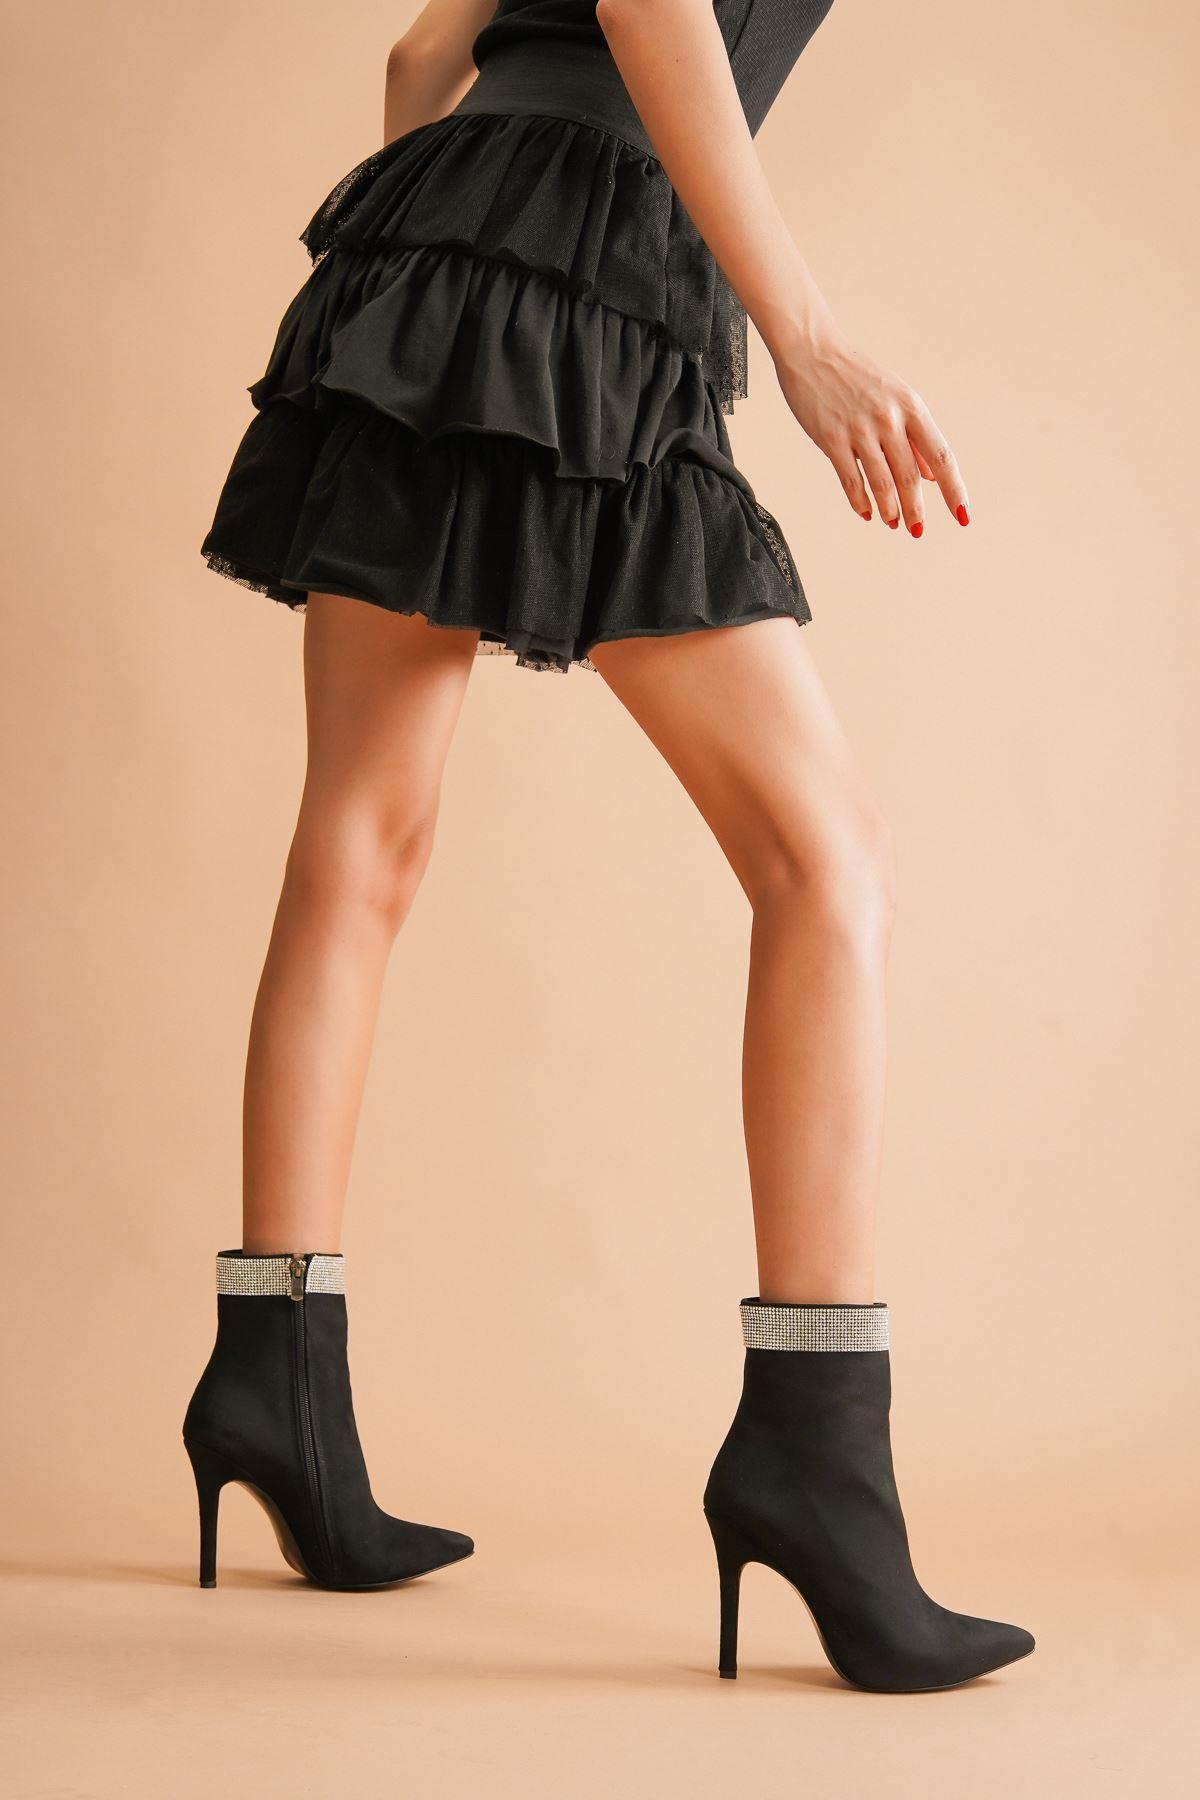 Diya Siyah Süet Taşlı Topuklu Kadın Bot